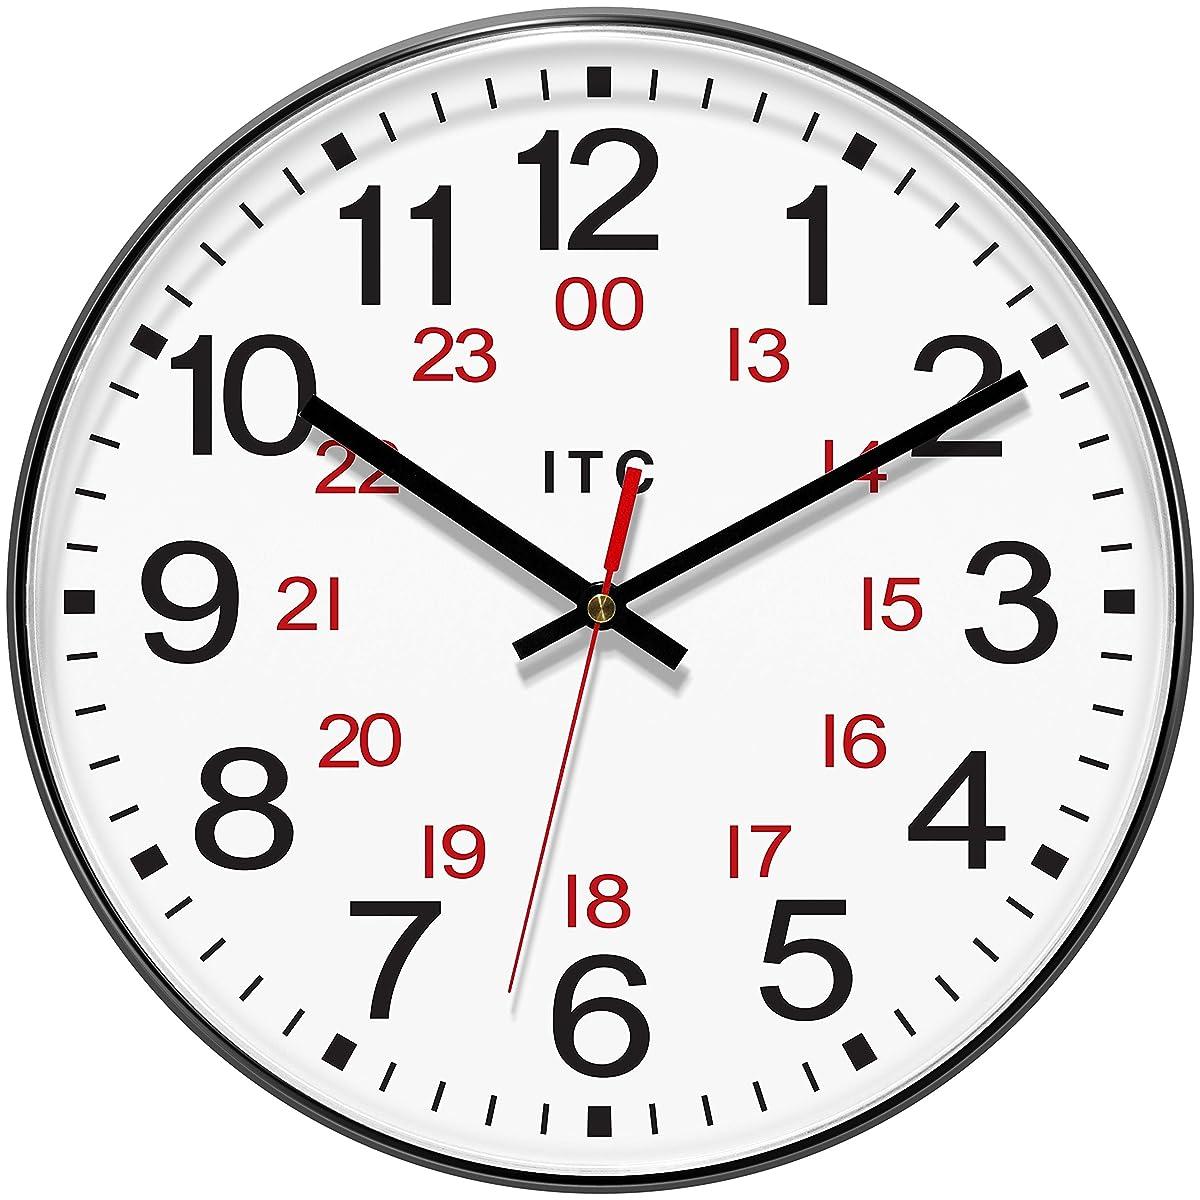 "INFINITY/ITC 90/1224-1 Combination 12/24 Hour Clock, 12"" Diameter"